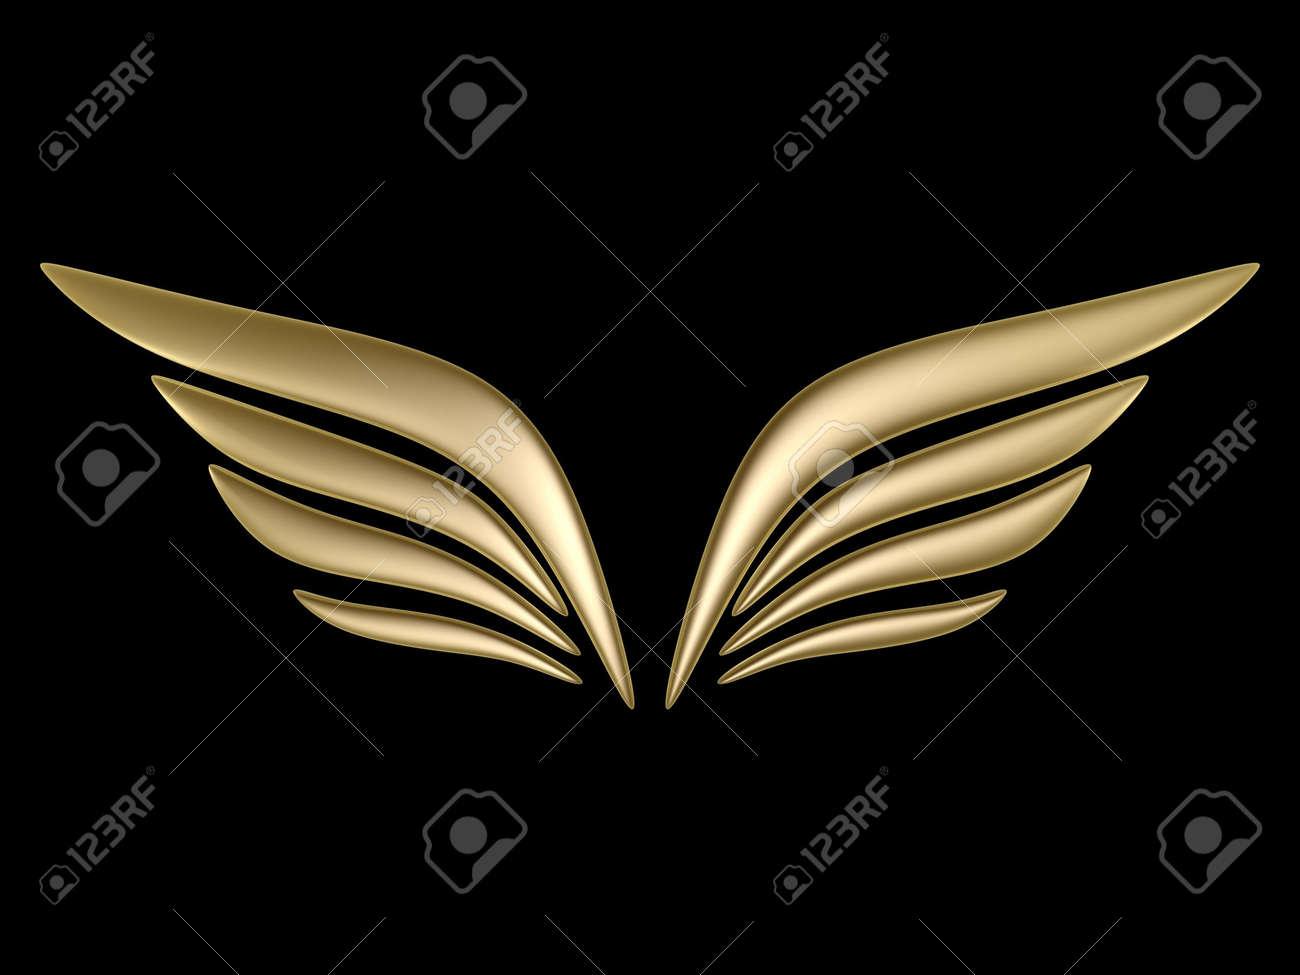 3d bird wing symbol isolated on black background stock photo 3d bird wing symbol isolated on black background stock photo 4764833 biocorpaavc